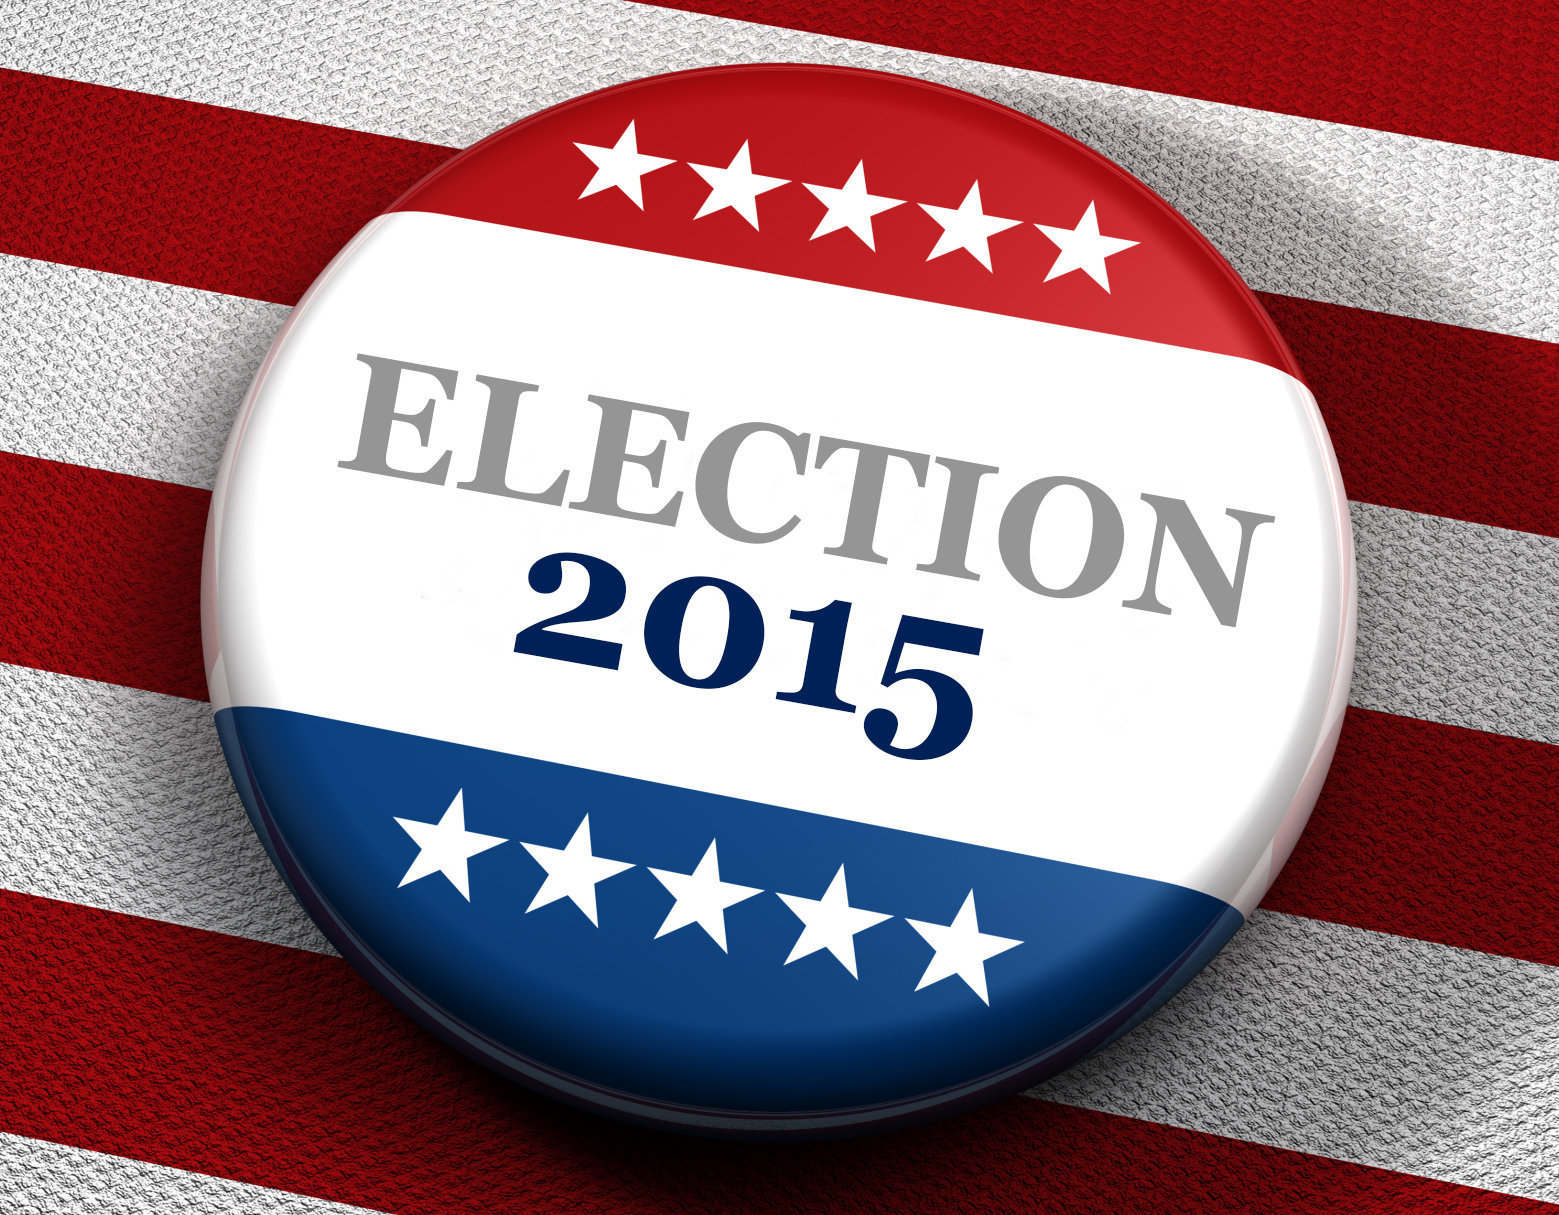 b5d3543b2059434234c6_Election_2015.jpg